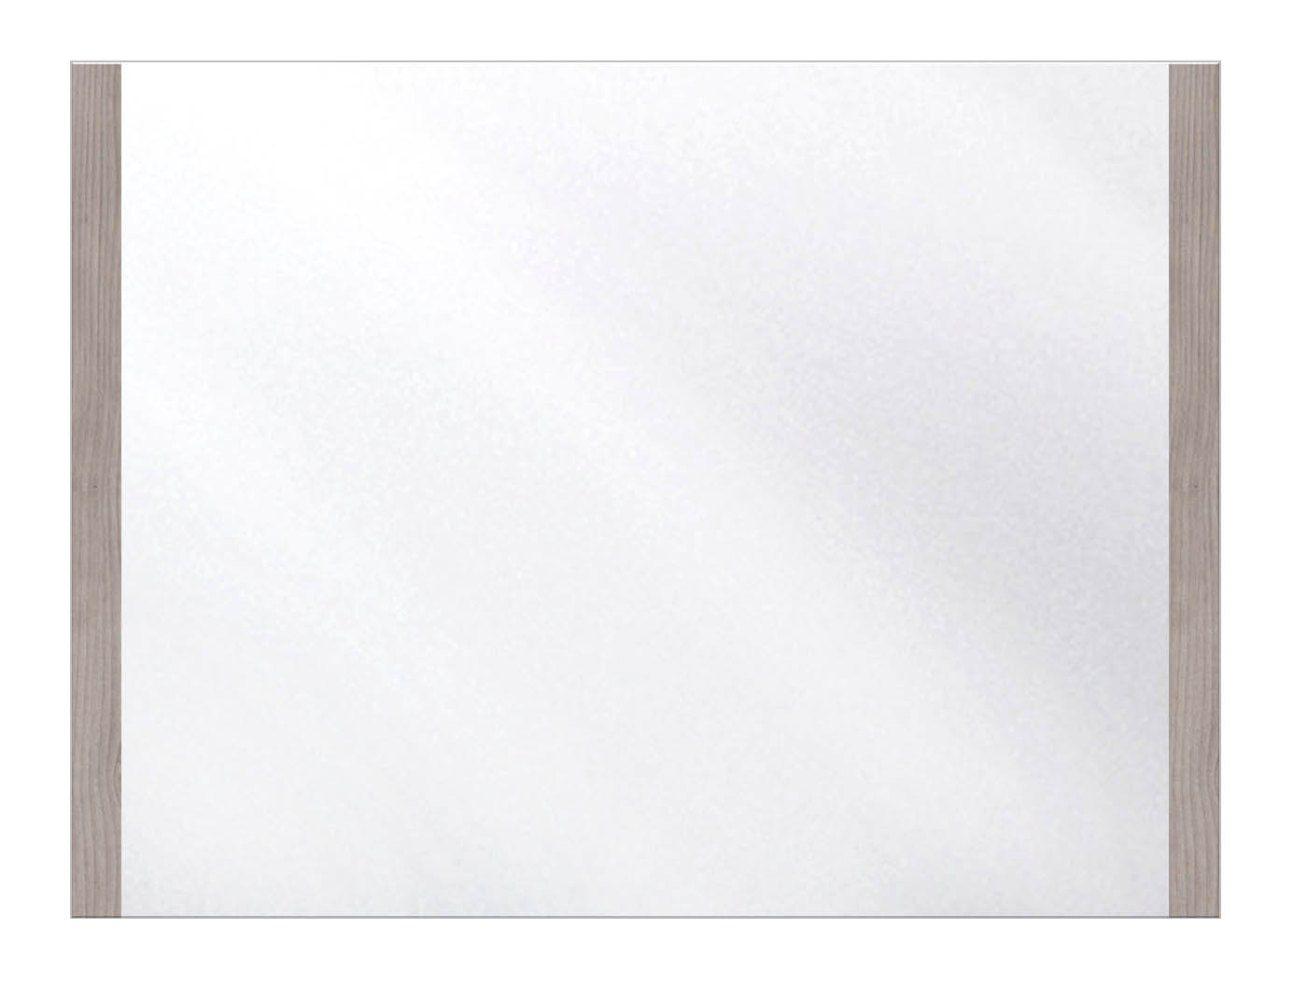 Spiegel Sabadell 06, Farbe: Eiche - 60 x 80 x 2 cm (H x B x T)